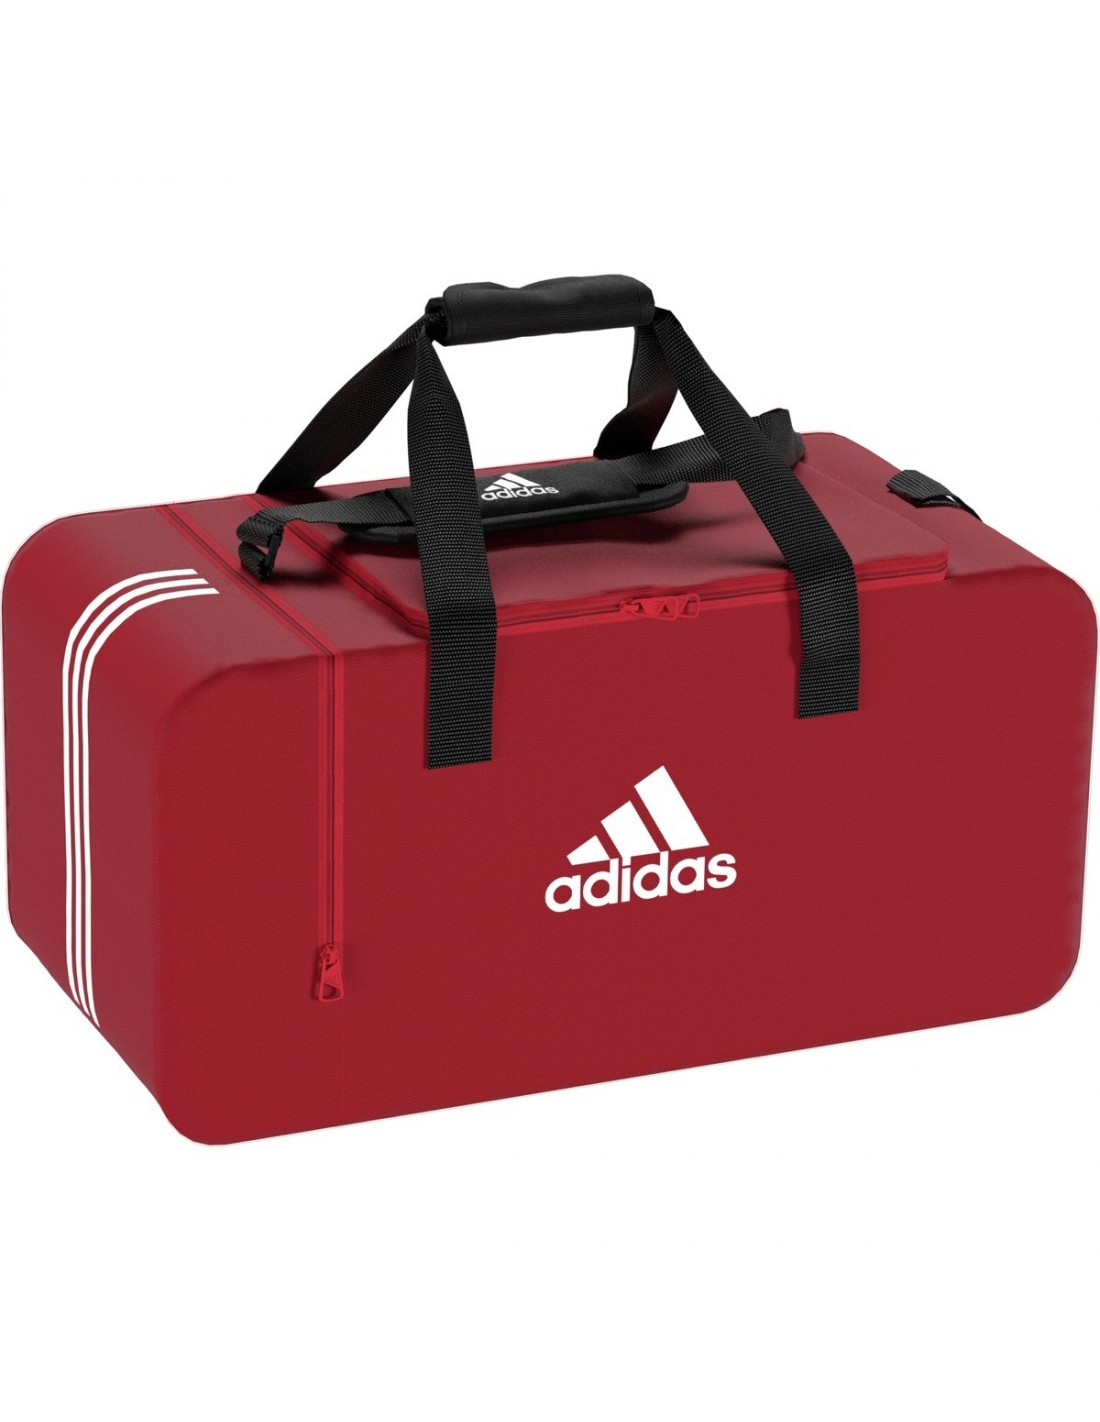 Bag 31-50L Adidas Tiro Duffle Bag Rød S DU1985 379 kr